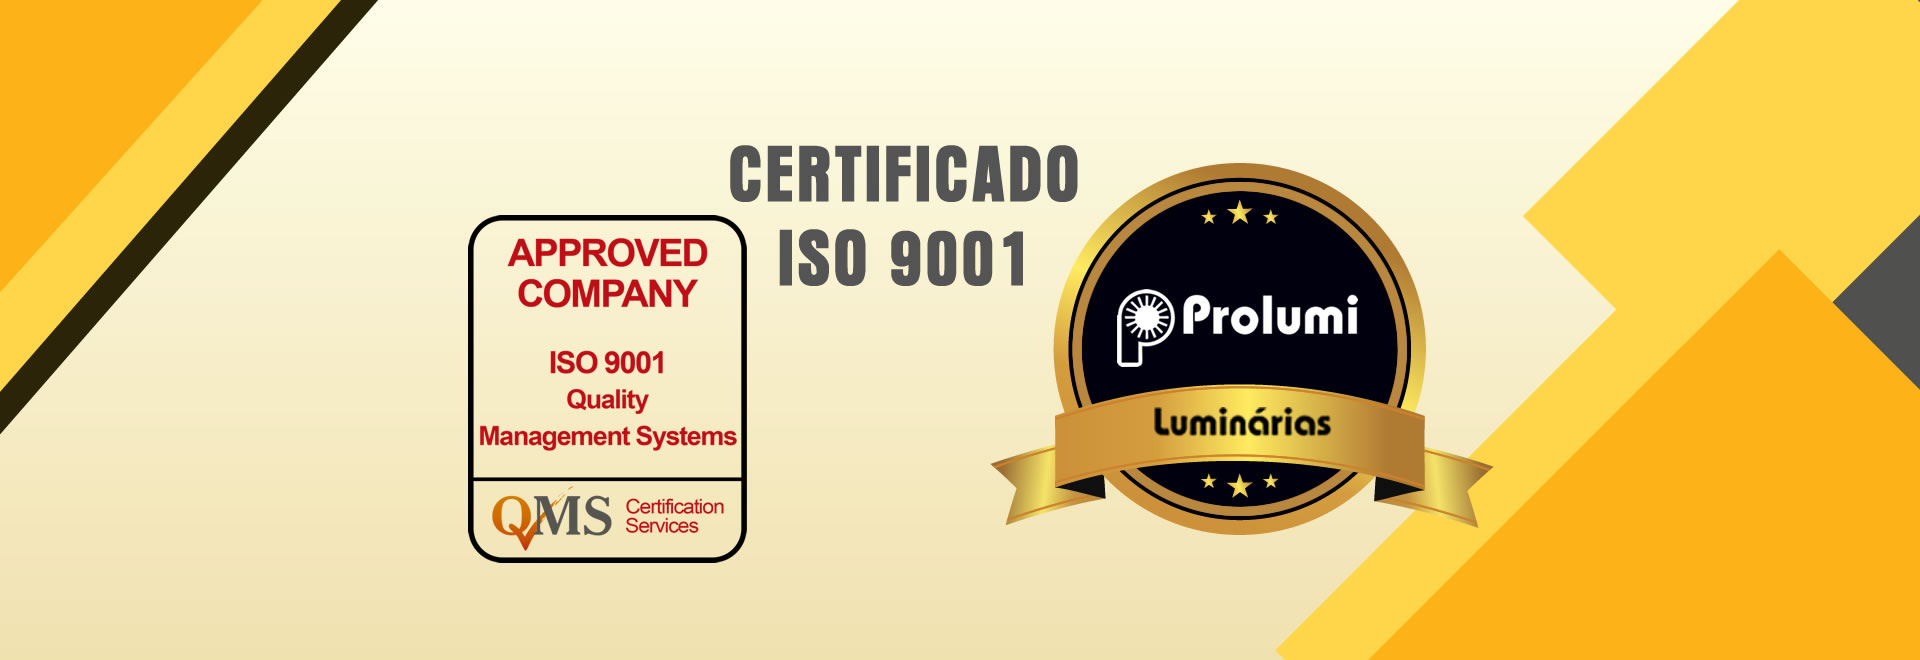 certificacao-iso-prolumi-1